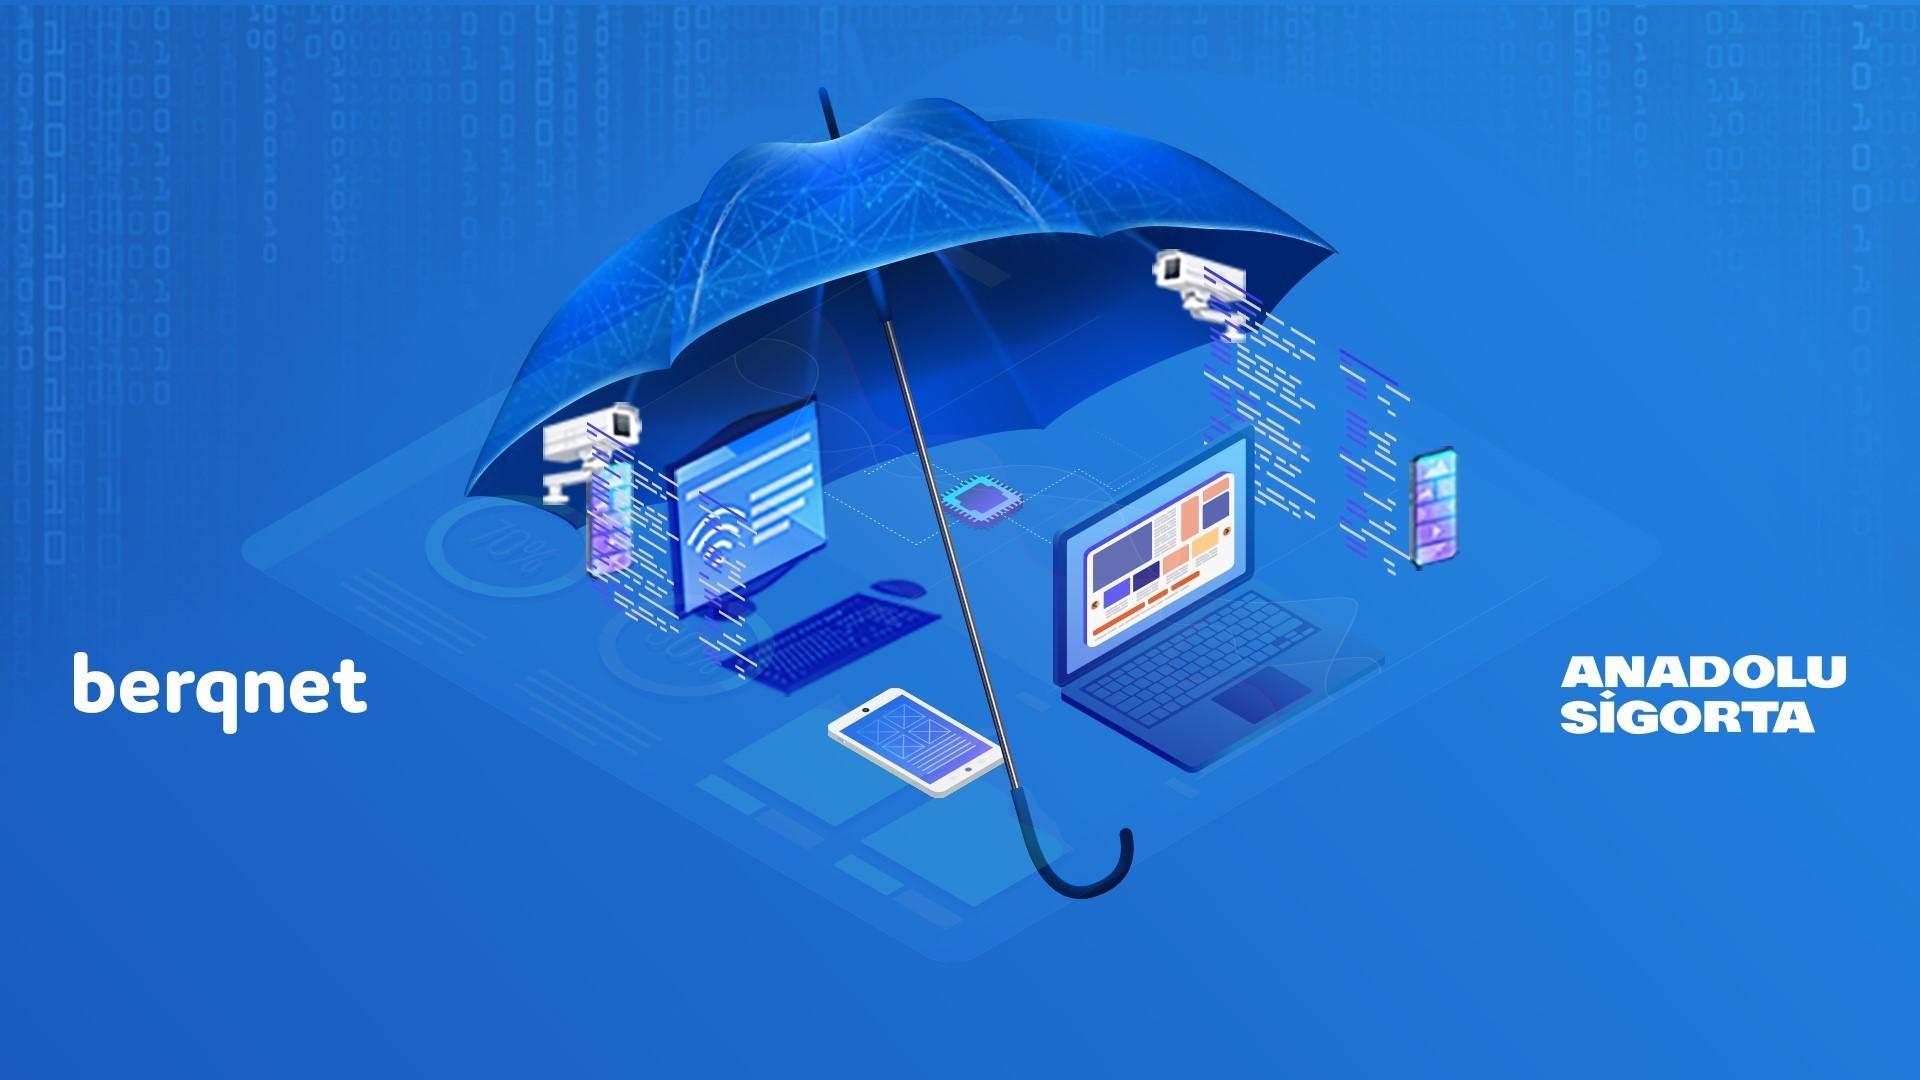 Berqnet Firewall'dan Siber Güvenlik Sektöründe Yepyeni Bir İnovasyon: Siber Sigortalı Firewall